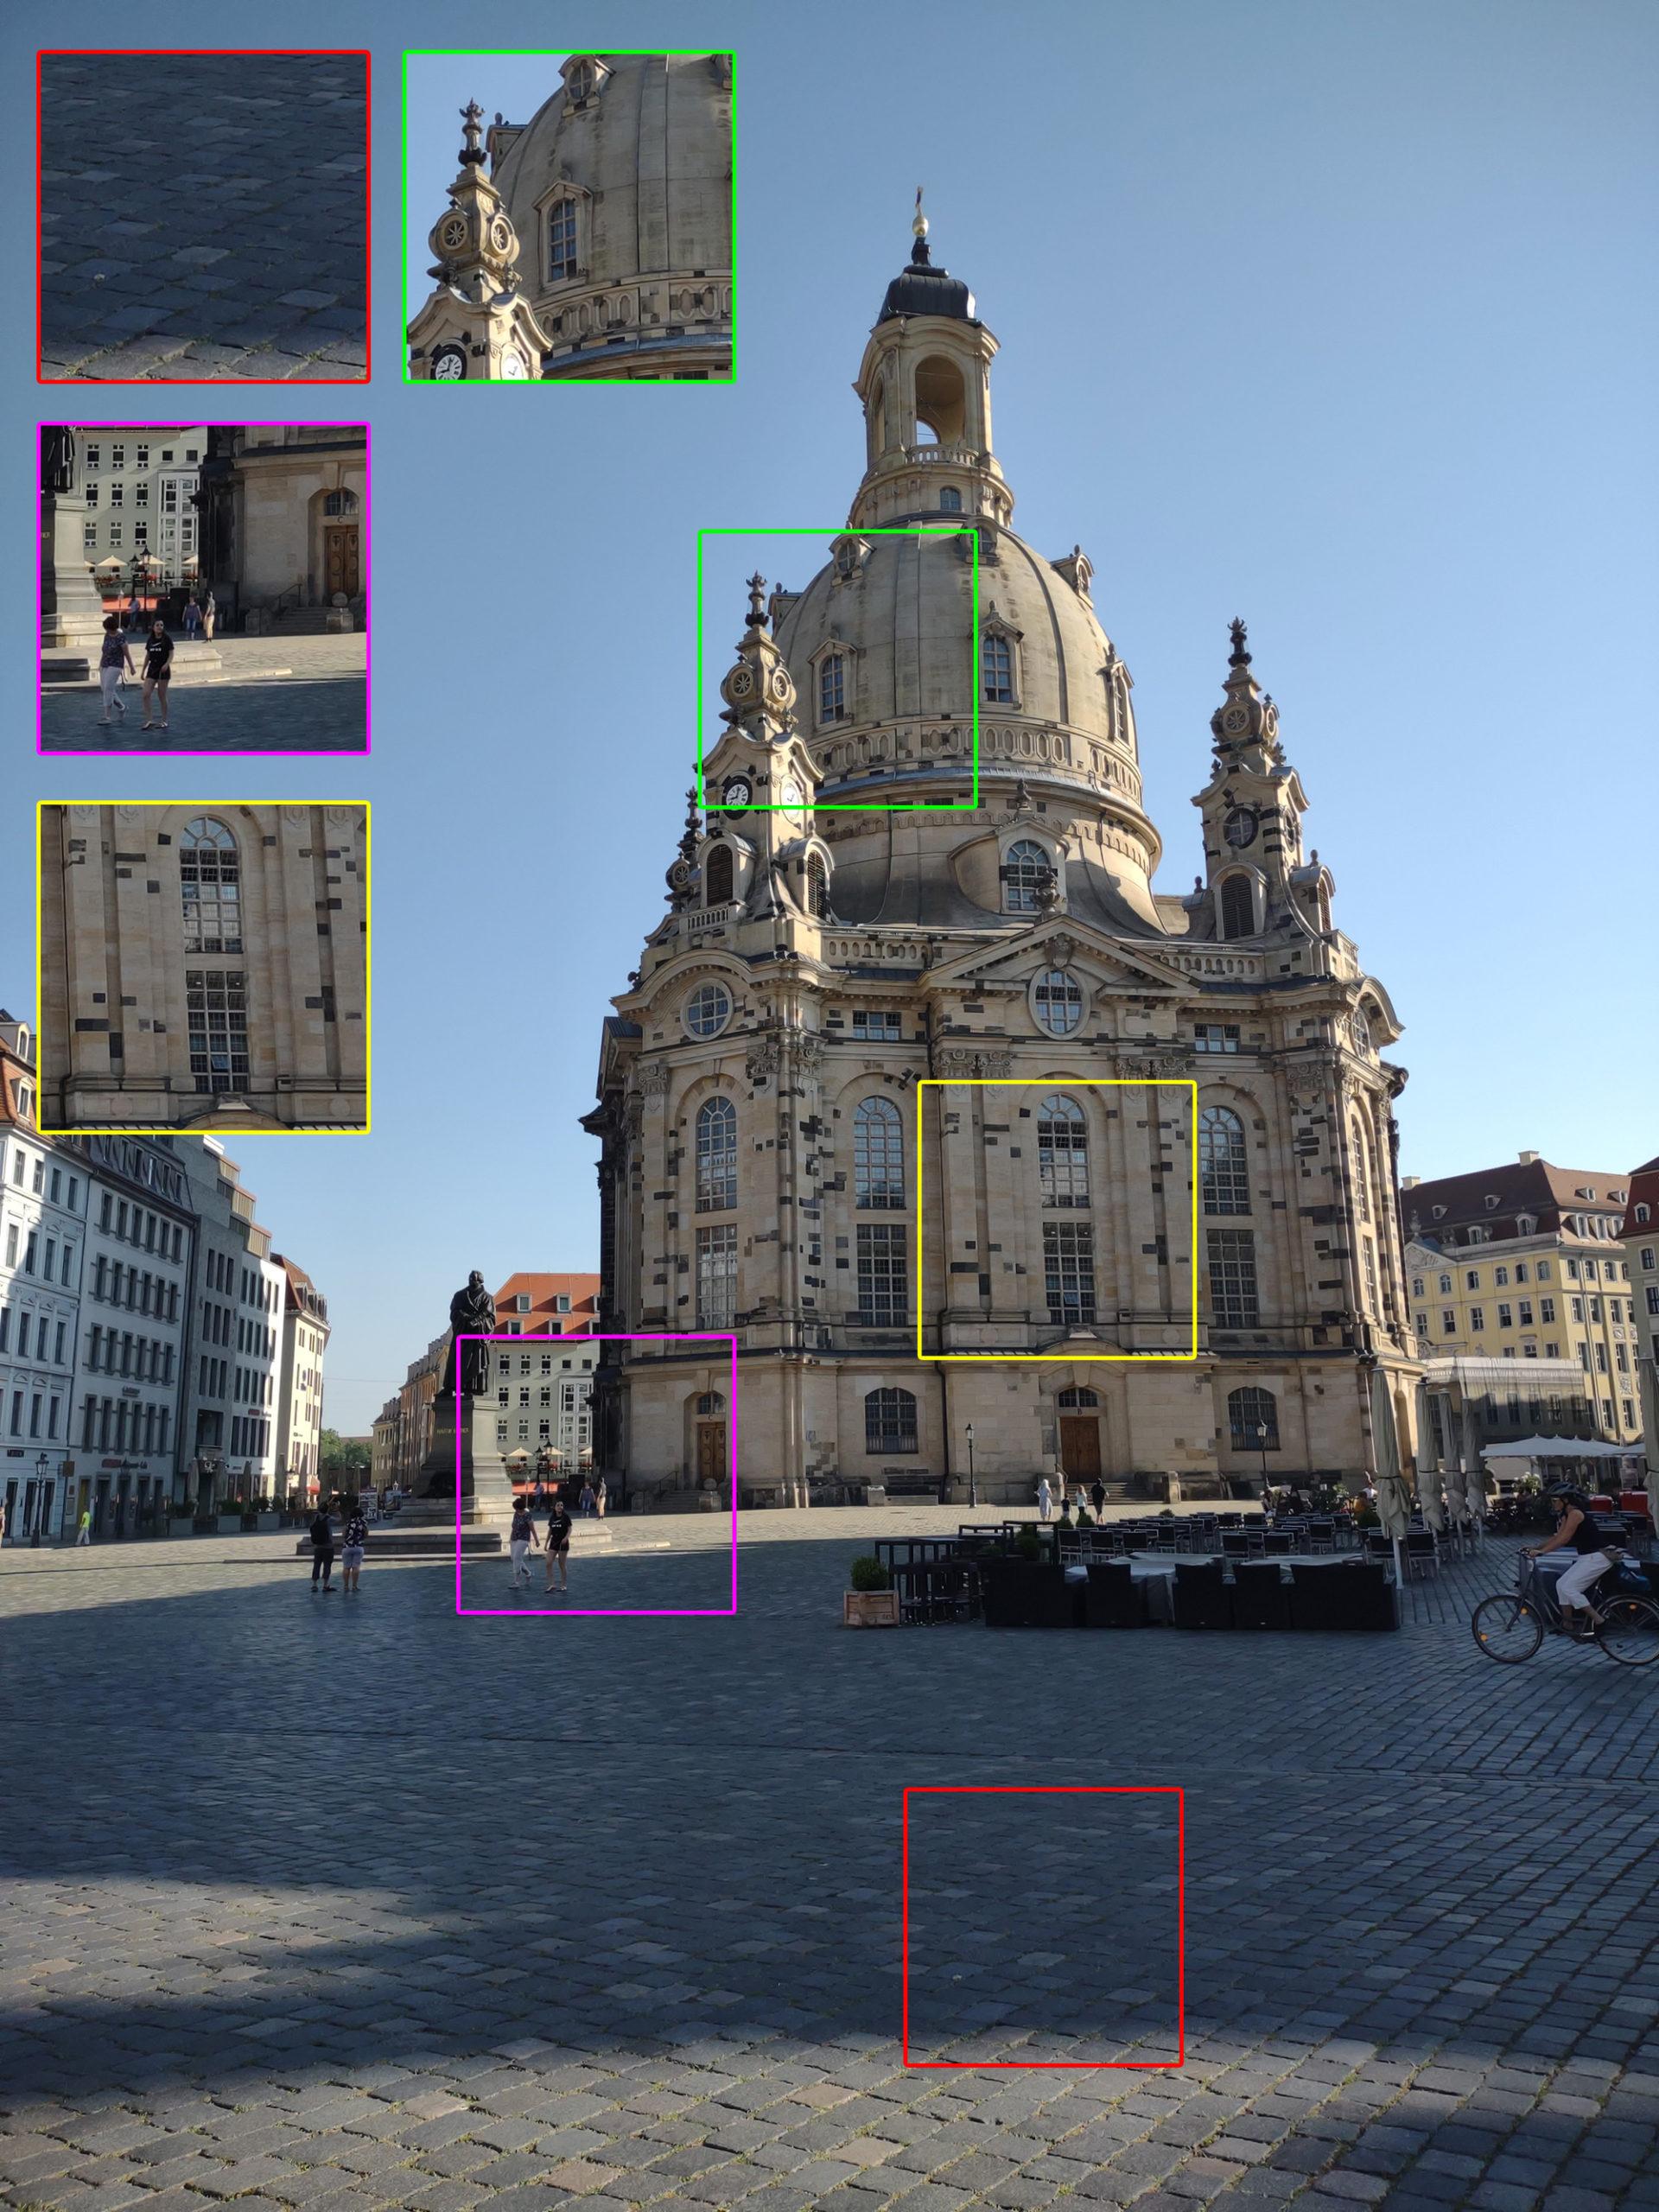 Dresdner Frauenkirche mit dem Motorola Moto G 5G Plus geschossen